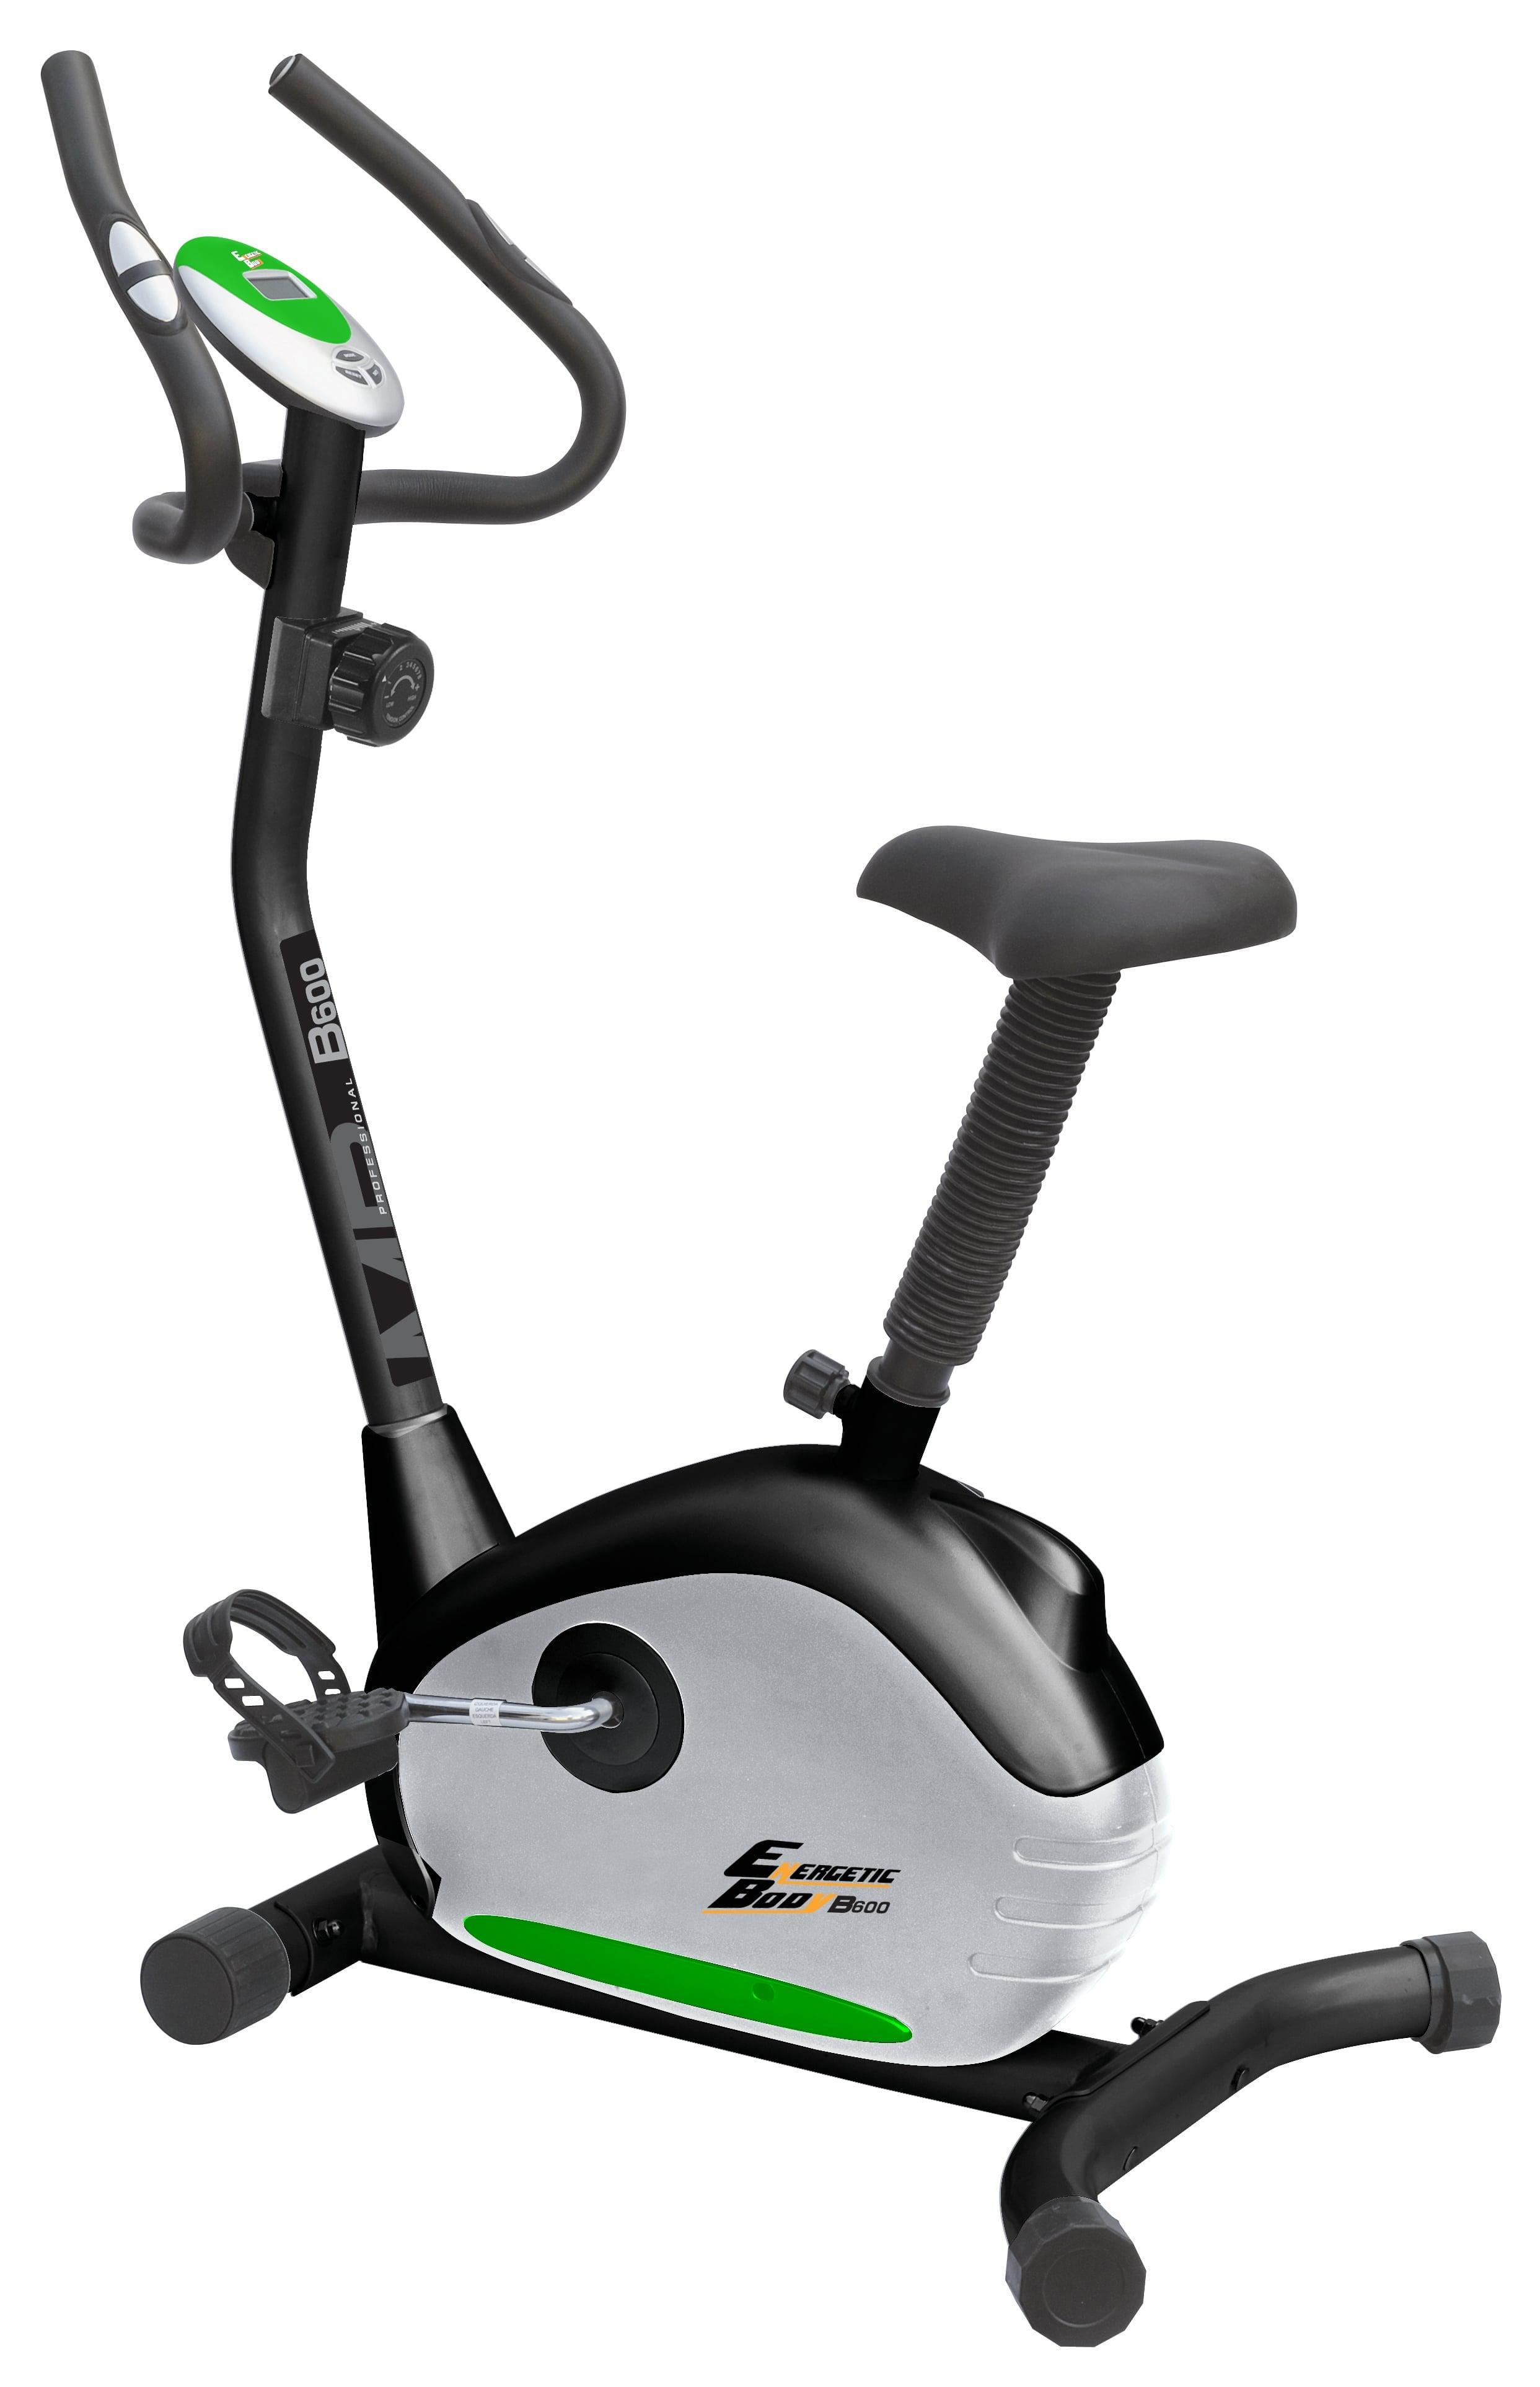 Магнитный велотренажёр B600 Energetic Body